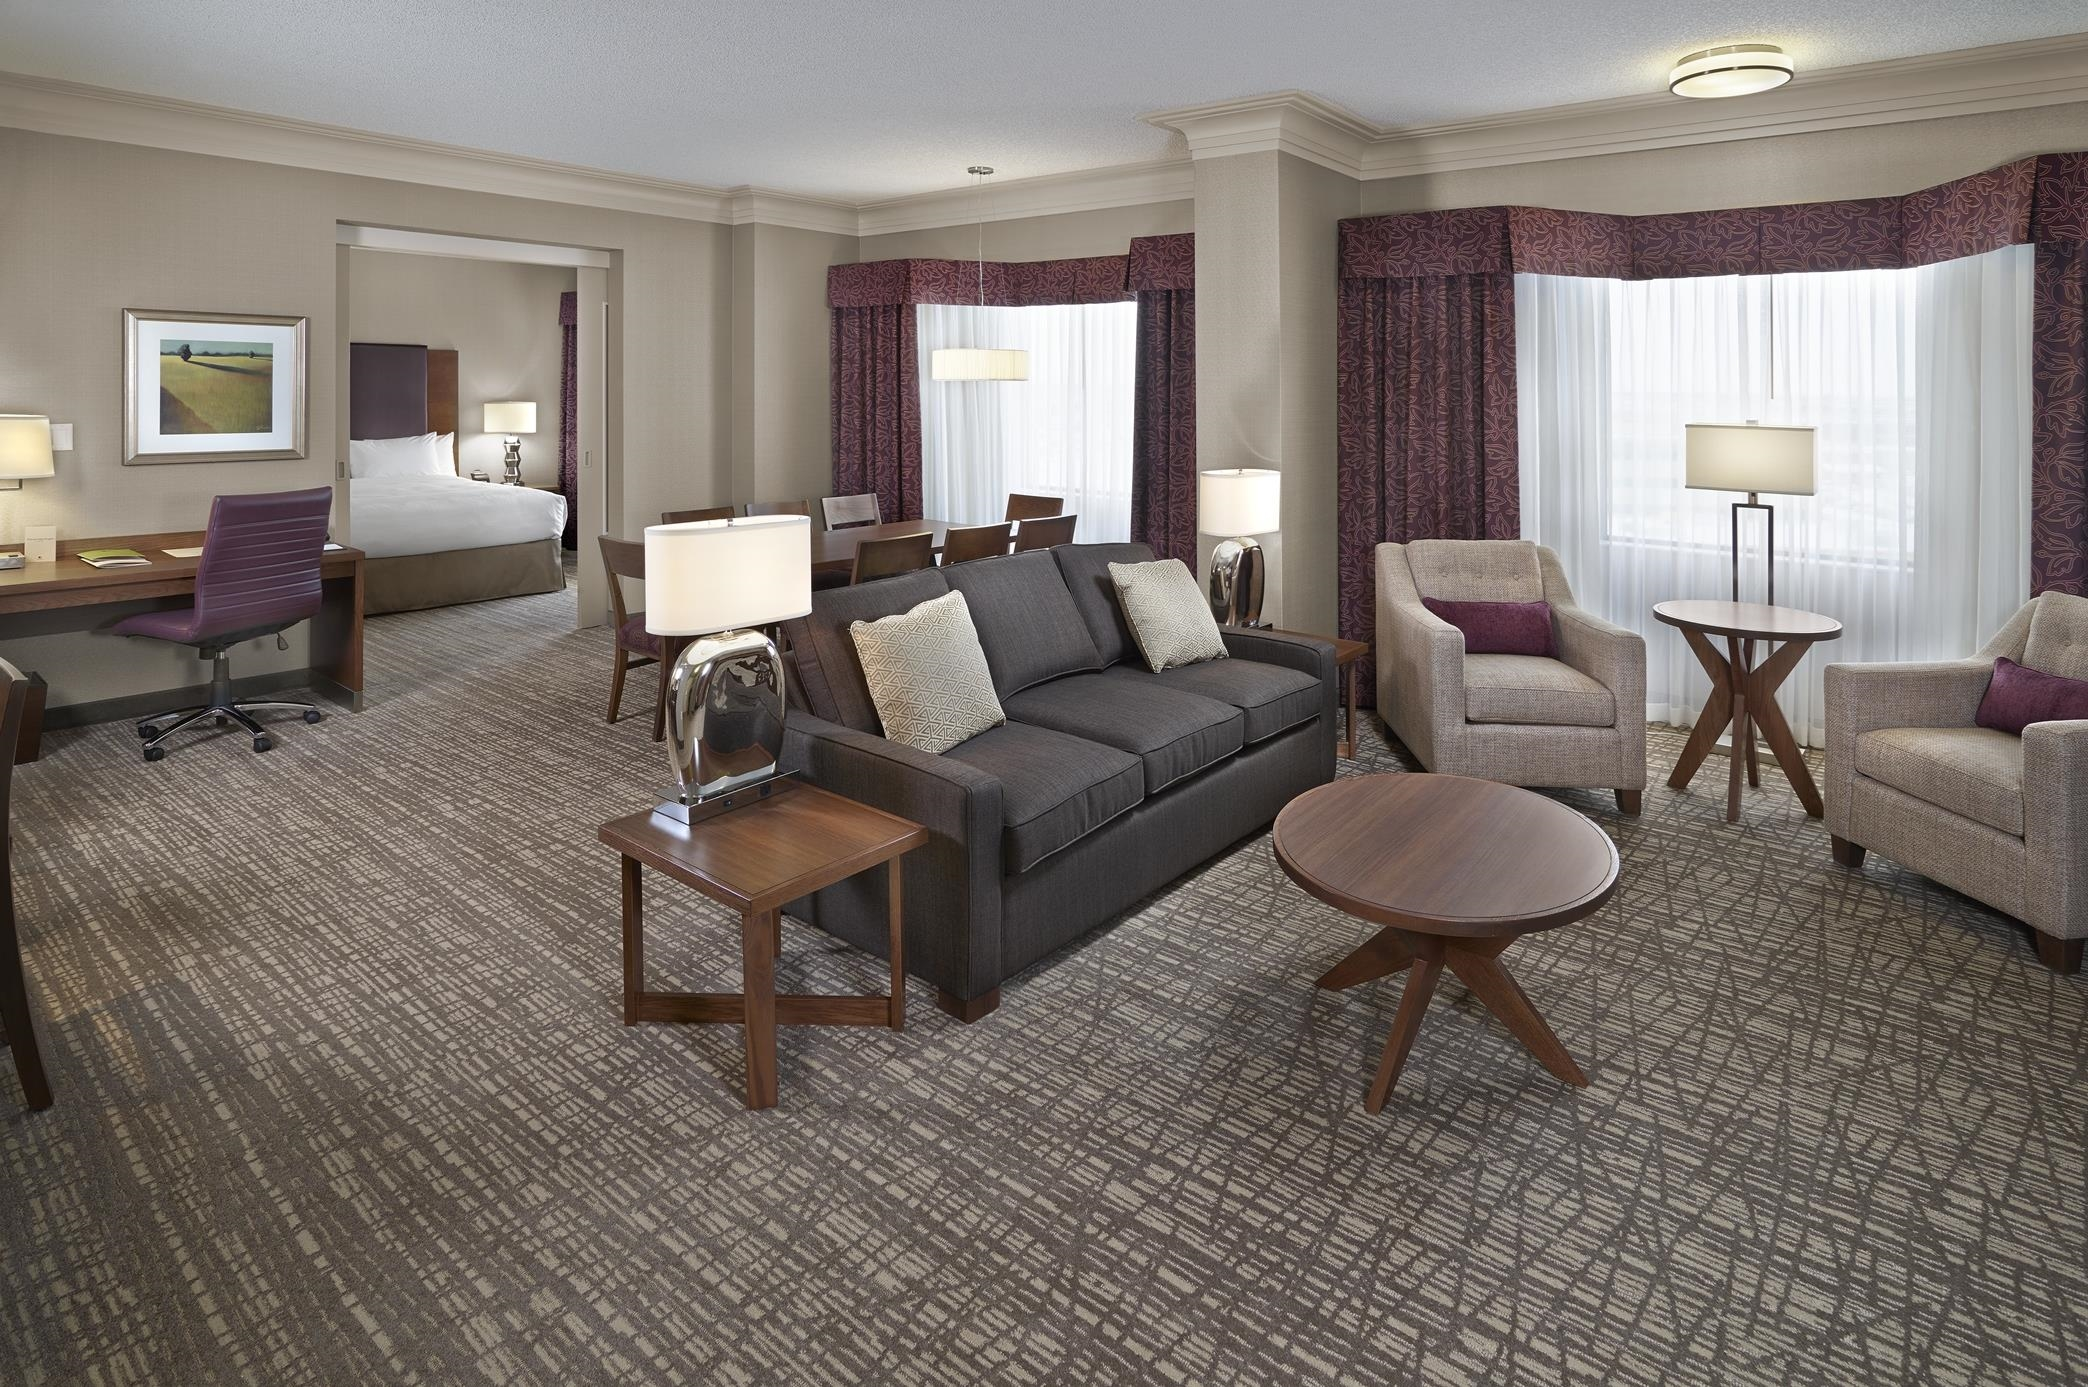 DoubleTree by Hilton Hotel West Edmonton in Edmonton: King Hospitality Suite Living Area